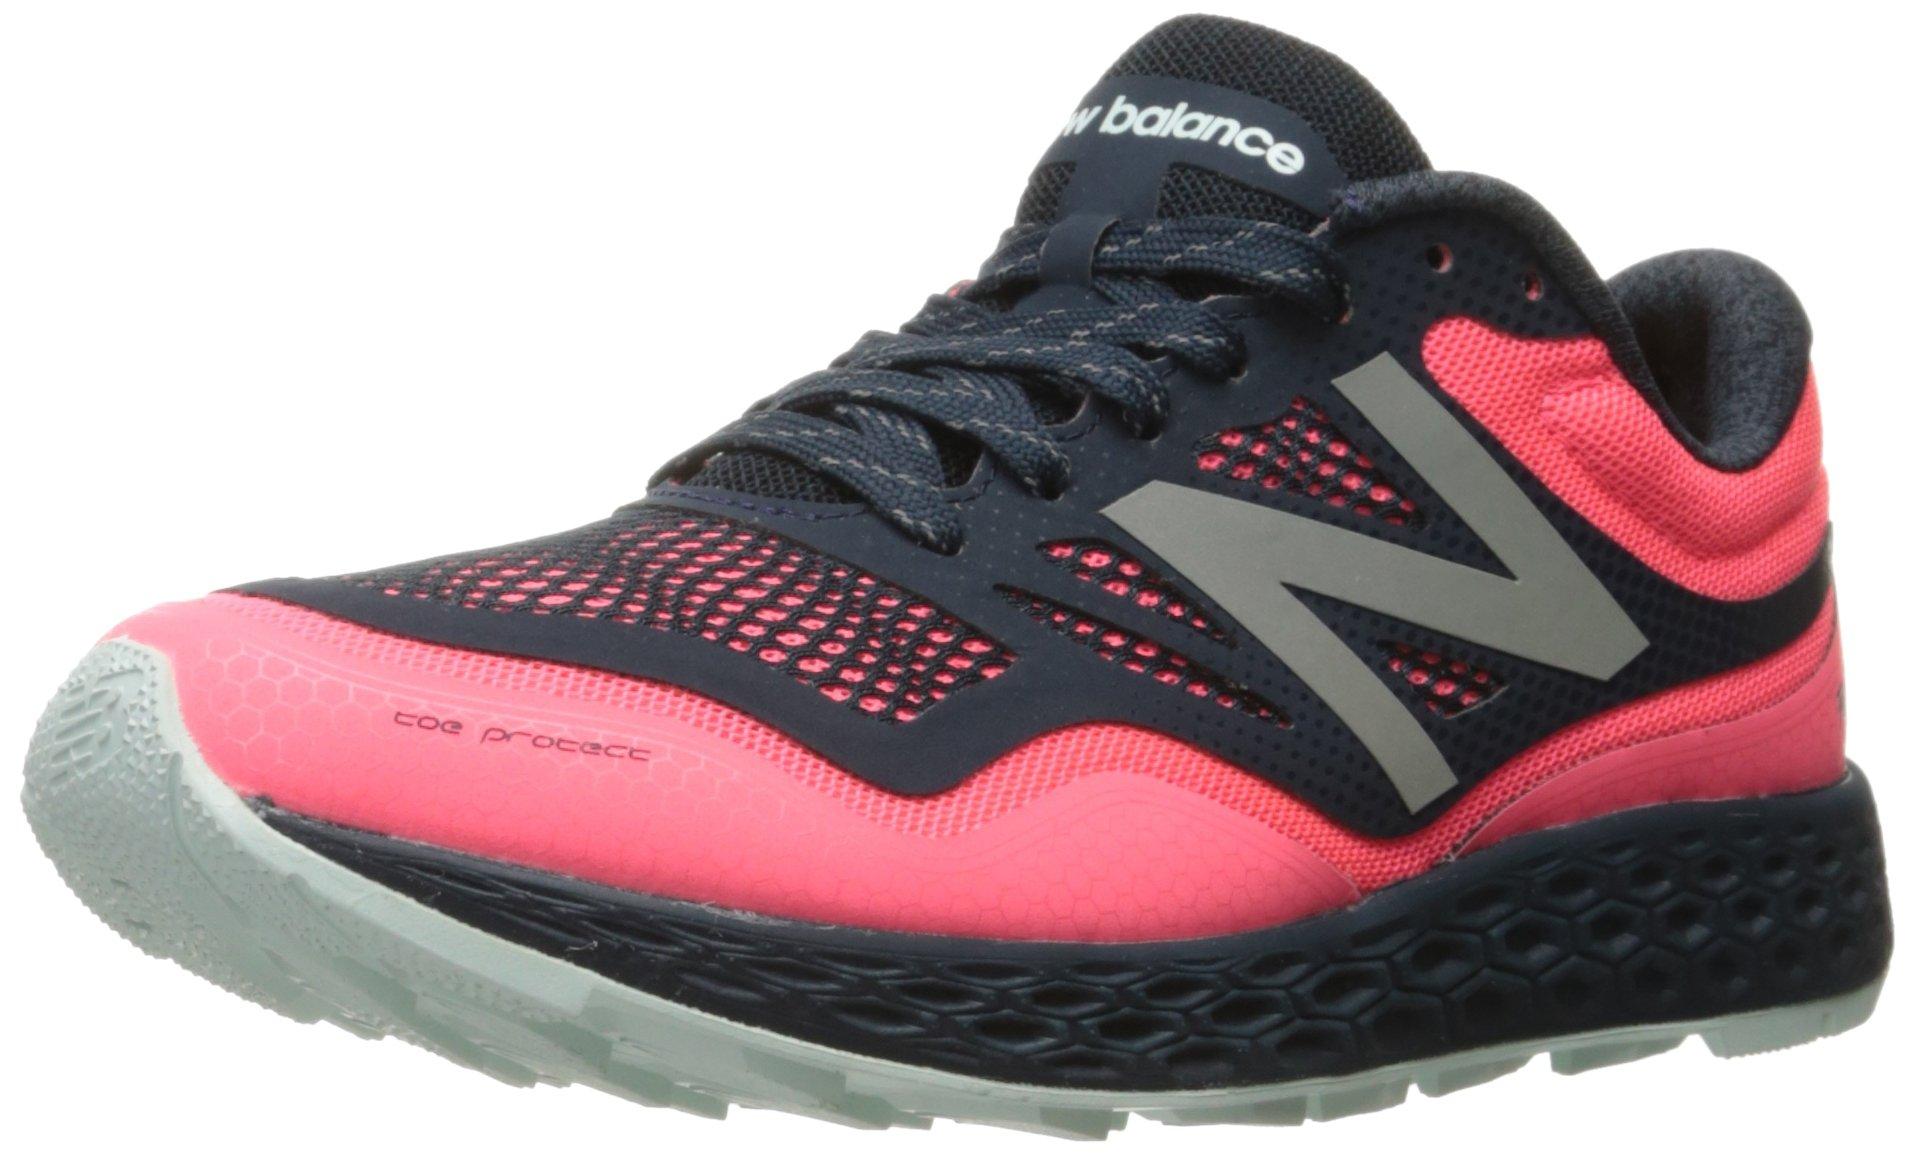 New Balance Women's Fresh Foam Gobi Trail Running Shoe, Guava/Black, 8 B US